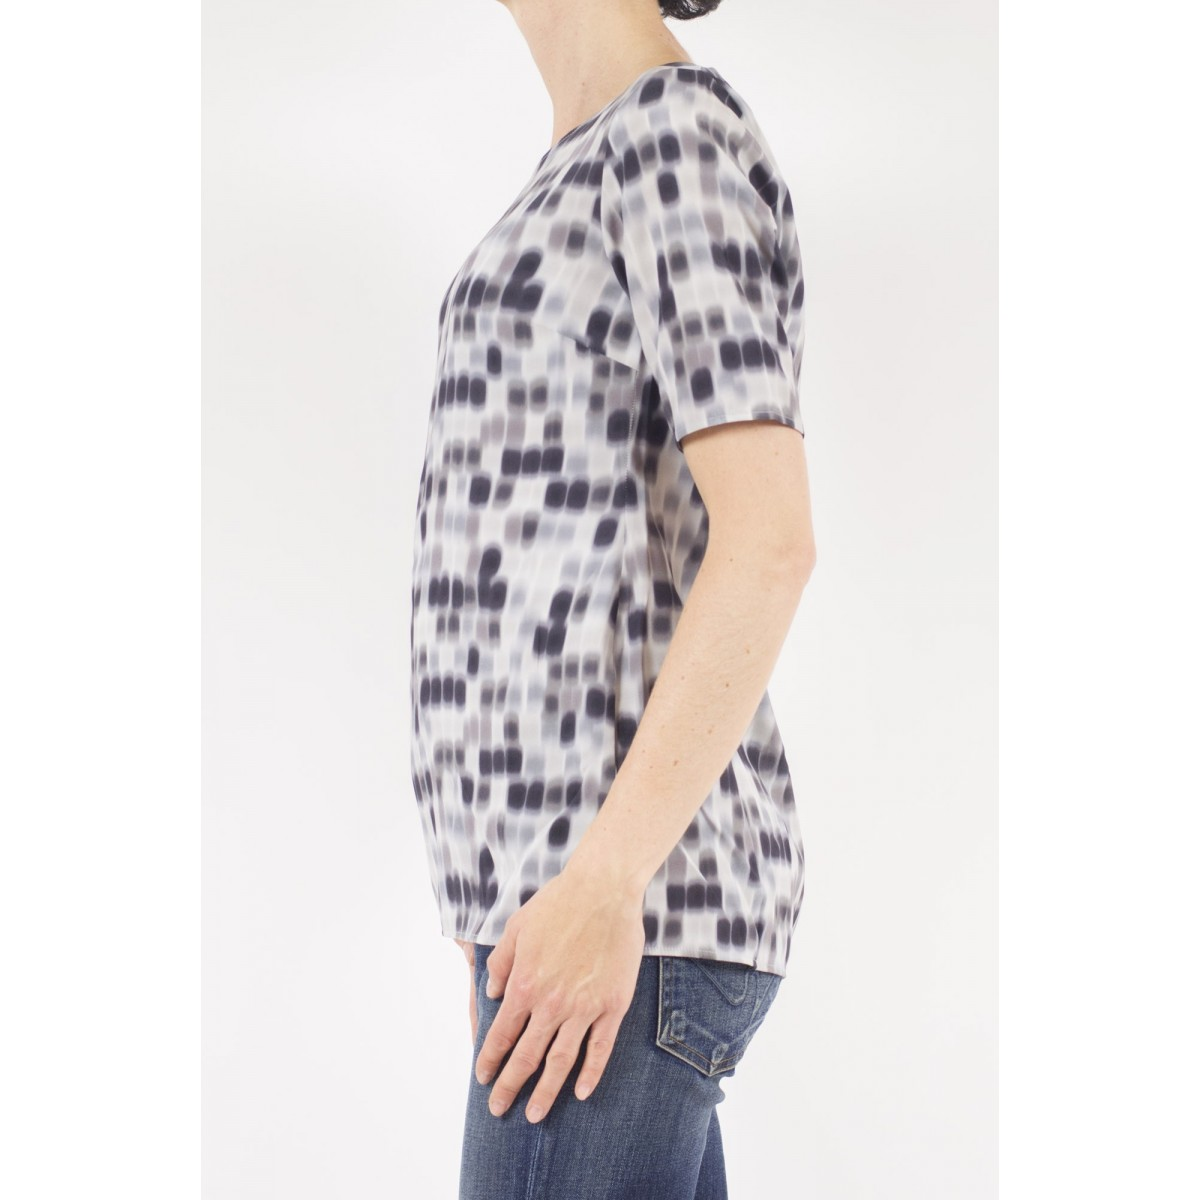 T-Shirt Woman Kangra - 7825/01 29 - grigio